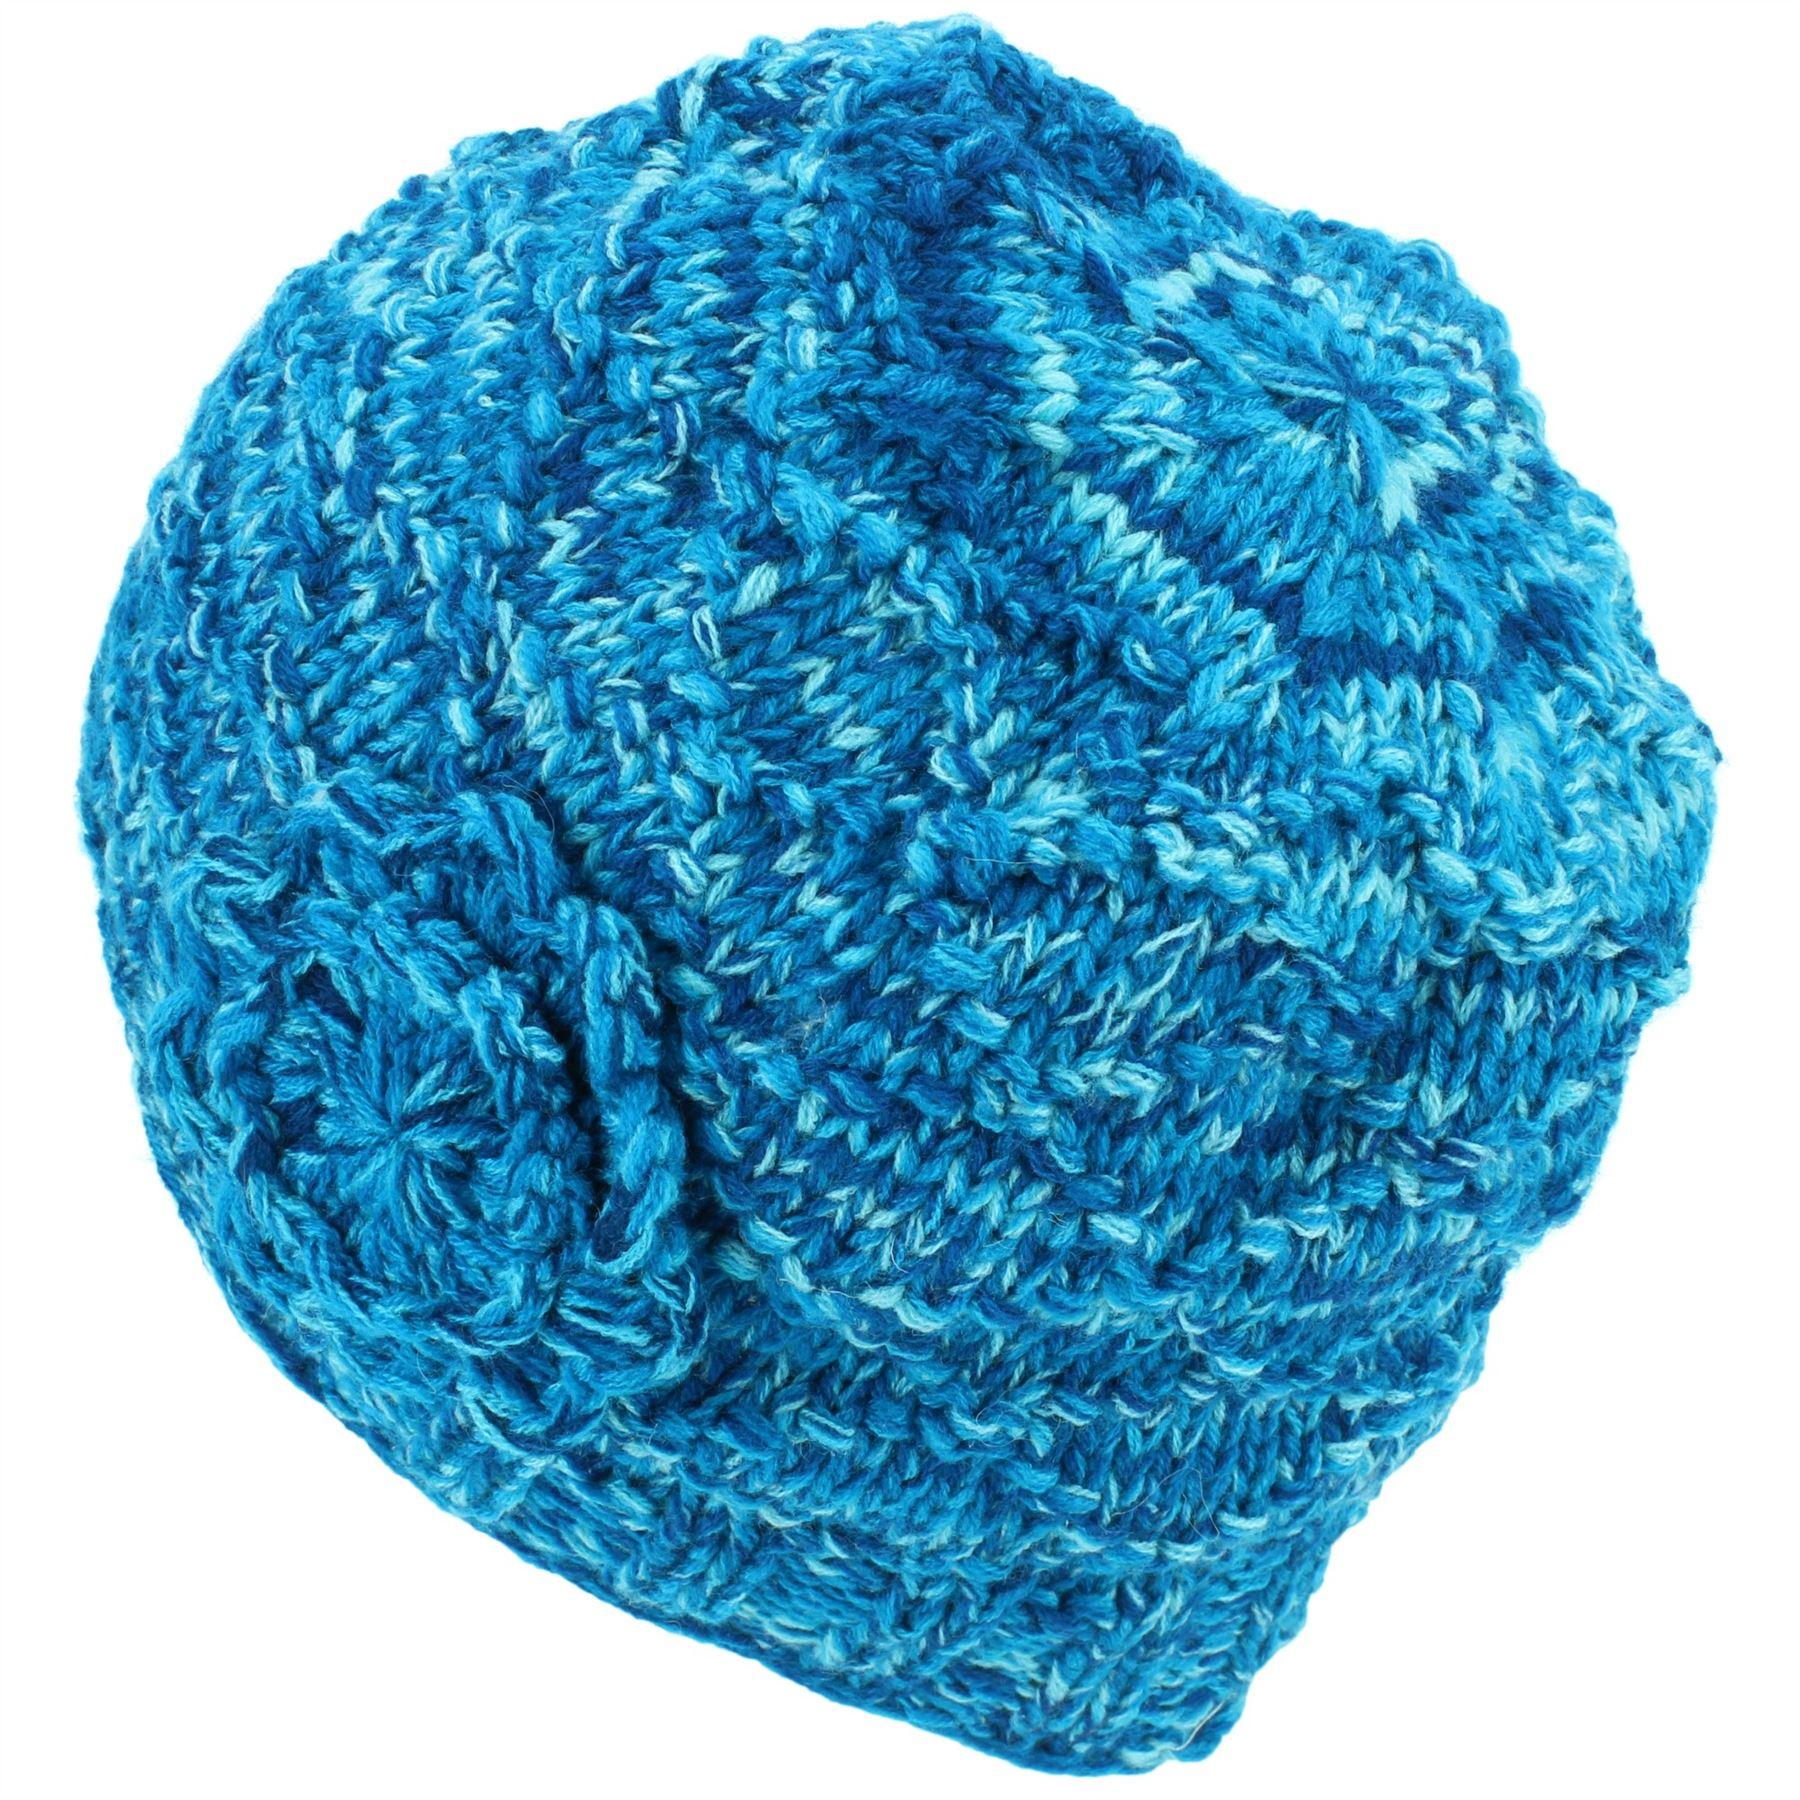 7ad78bb94dd Beanie Hat Cap Warm Winter Flower Soft Lined LoudElephant Acrylic ...